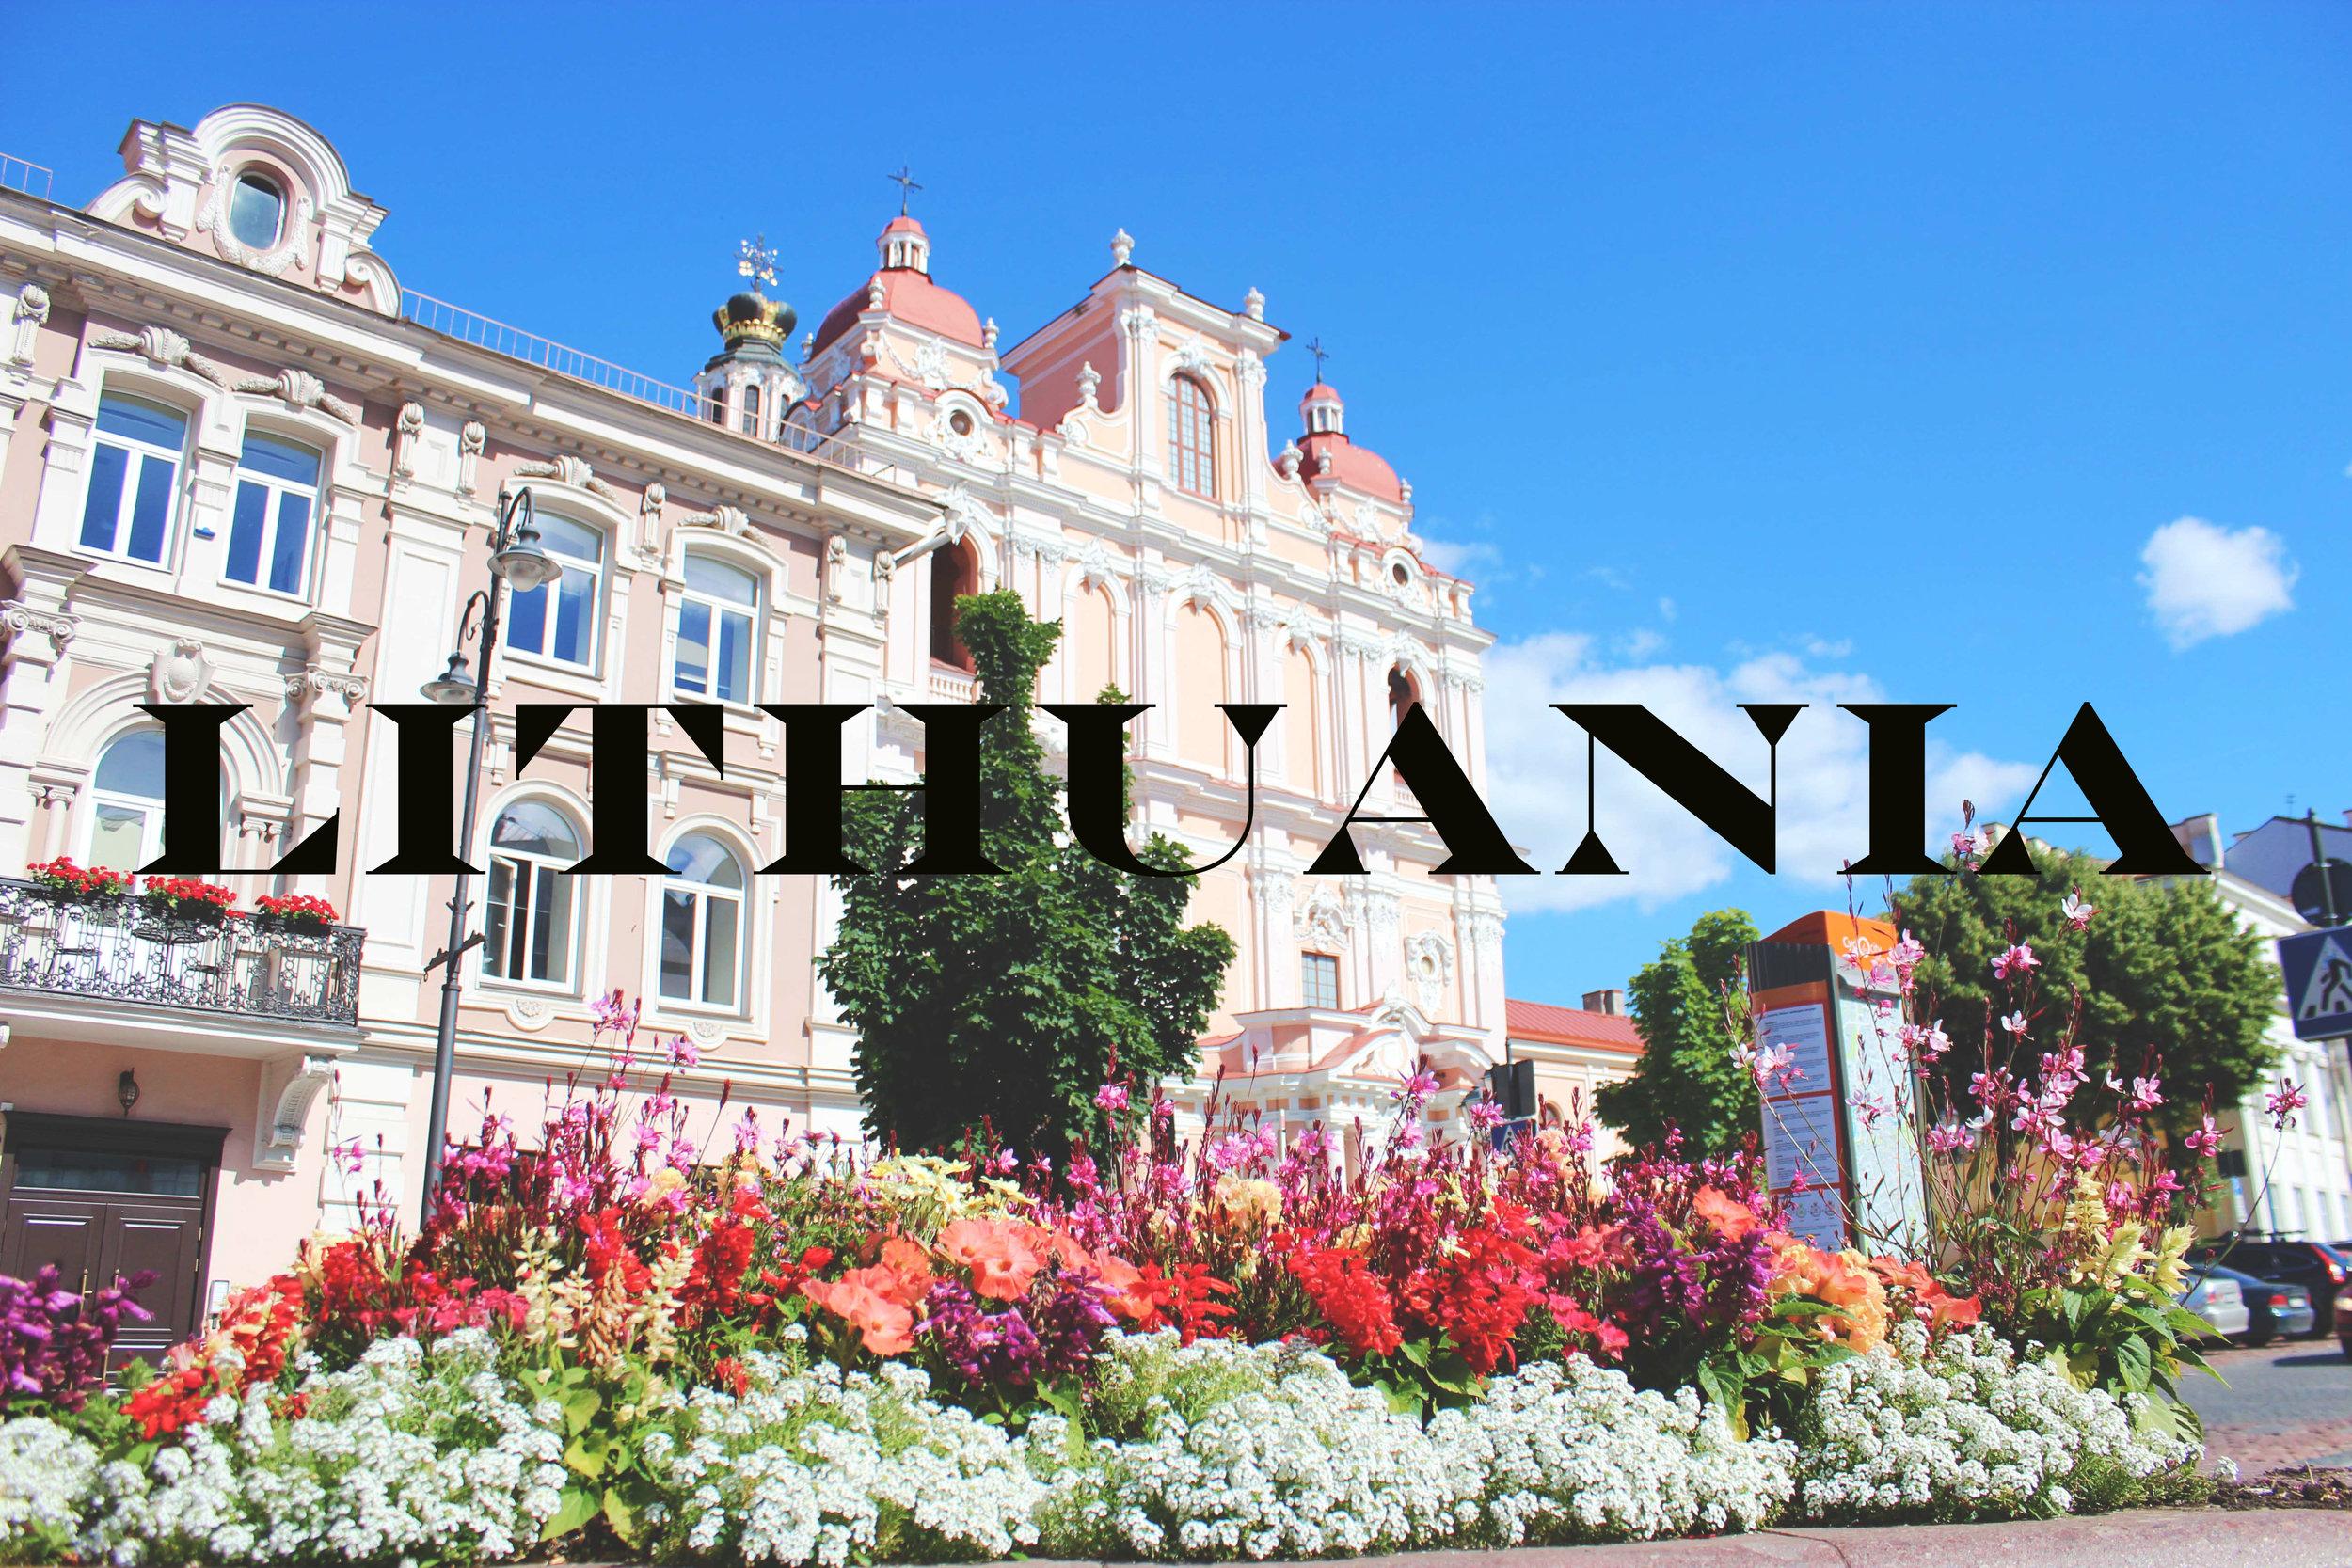 The Not-So Villainous Vilnius